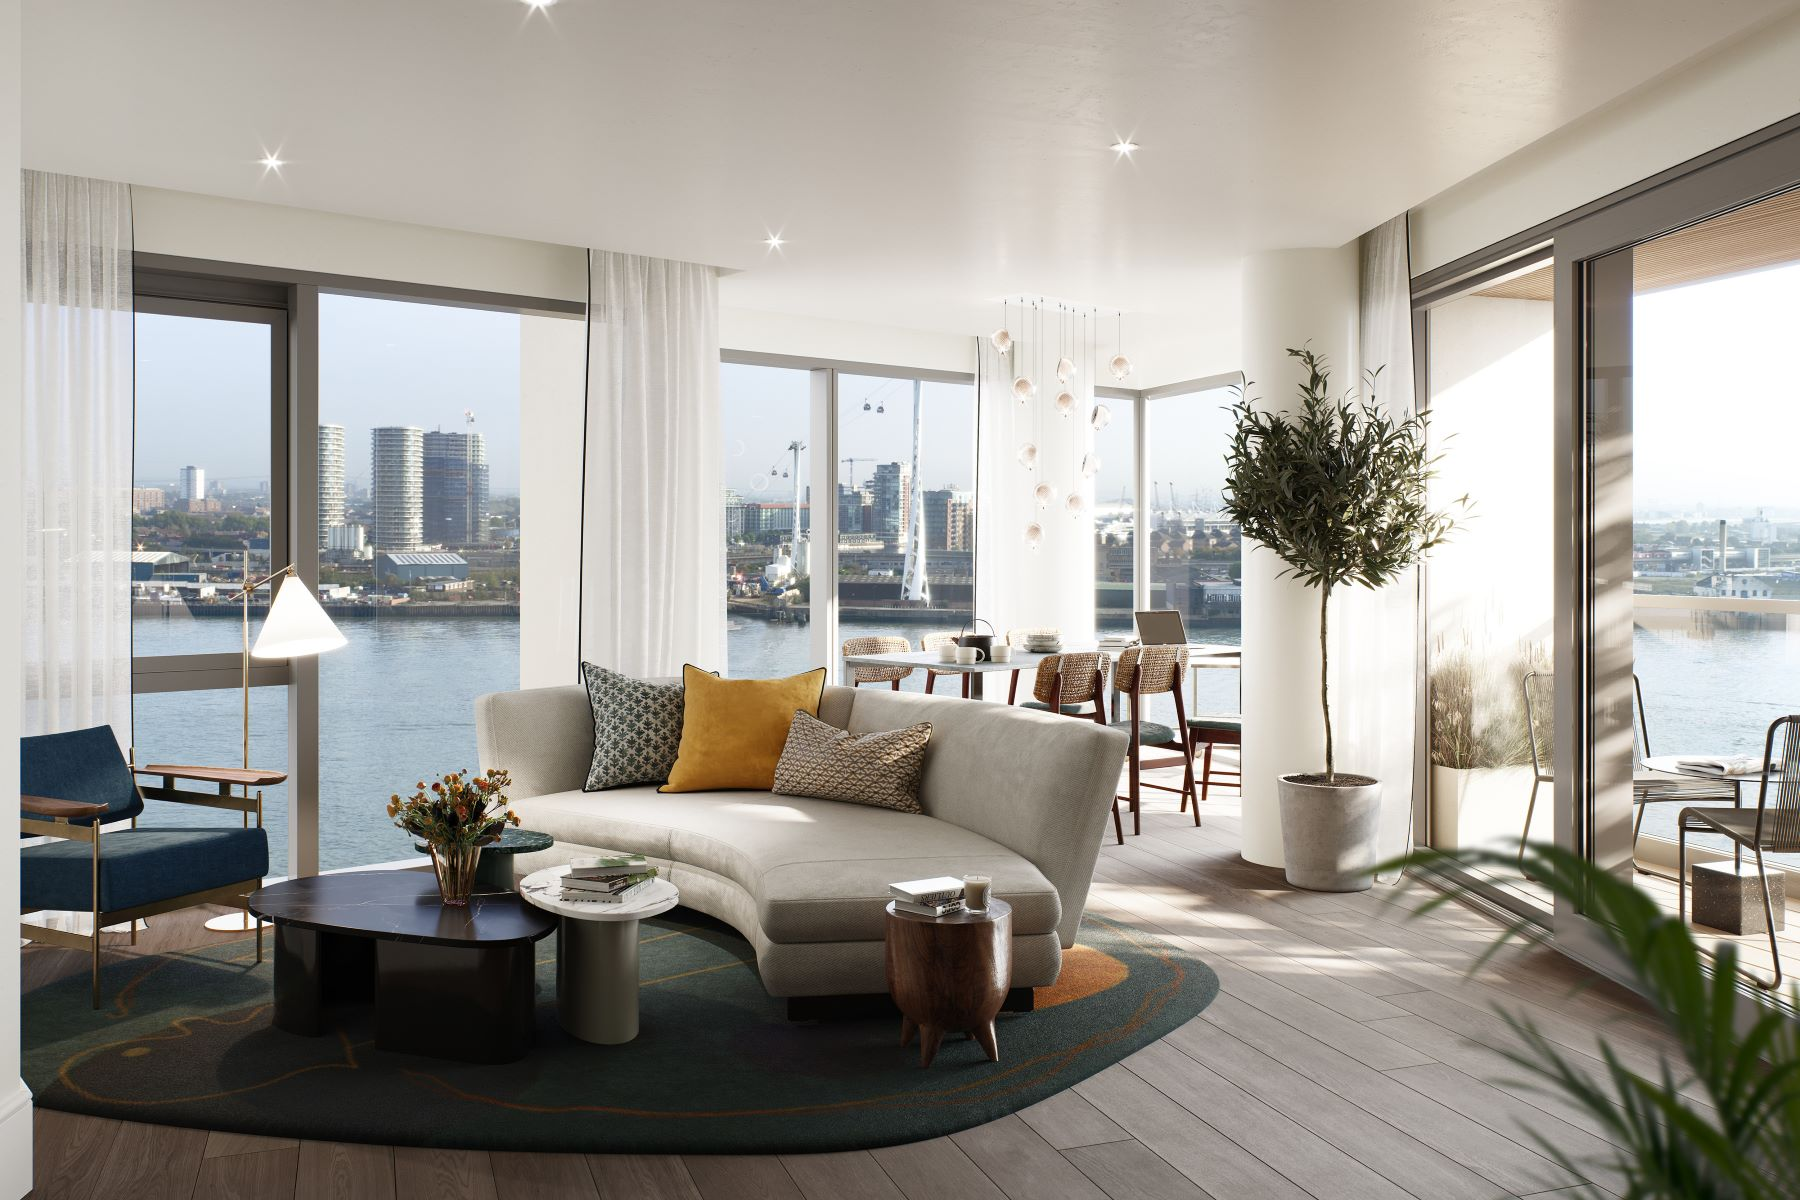 Apartments for Sale at Greenwich Peninsula Building 3 (13.05), Upper Riverside London, England SE10 0SQ United Kingdom